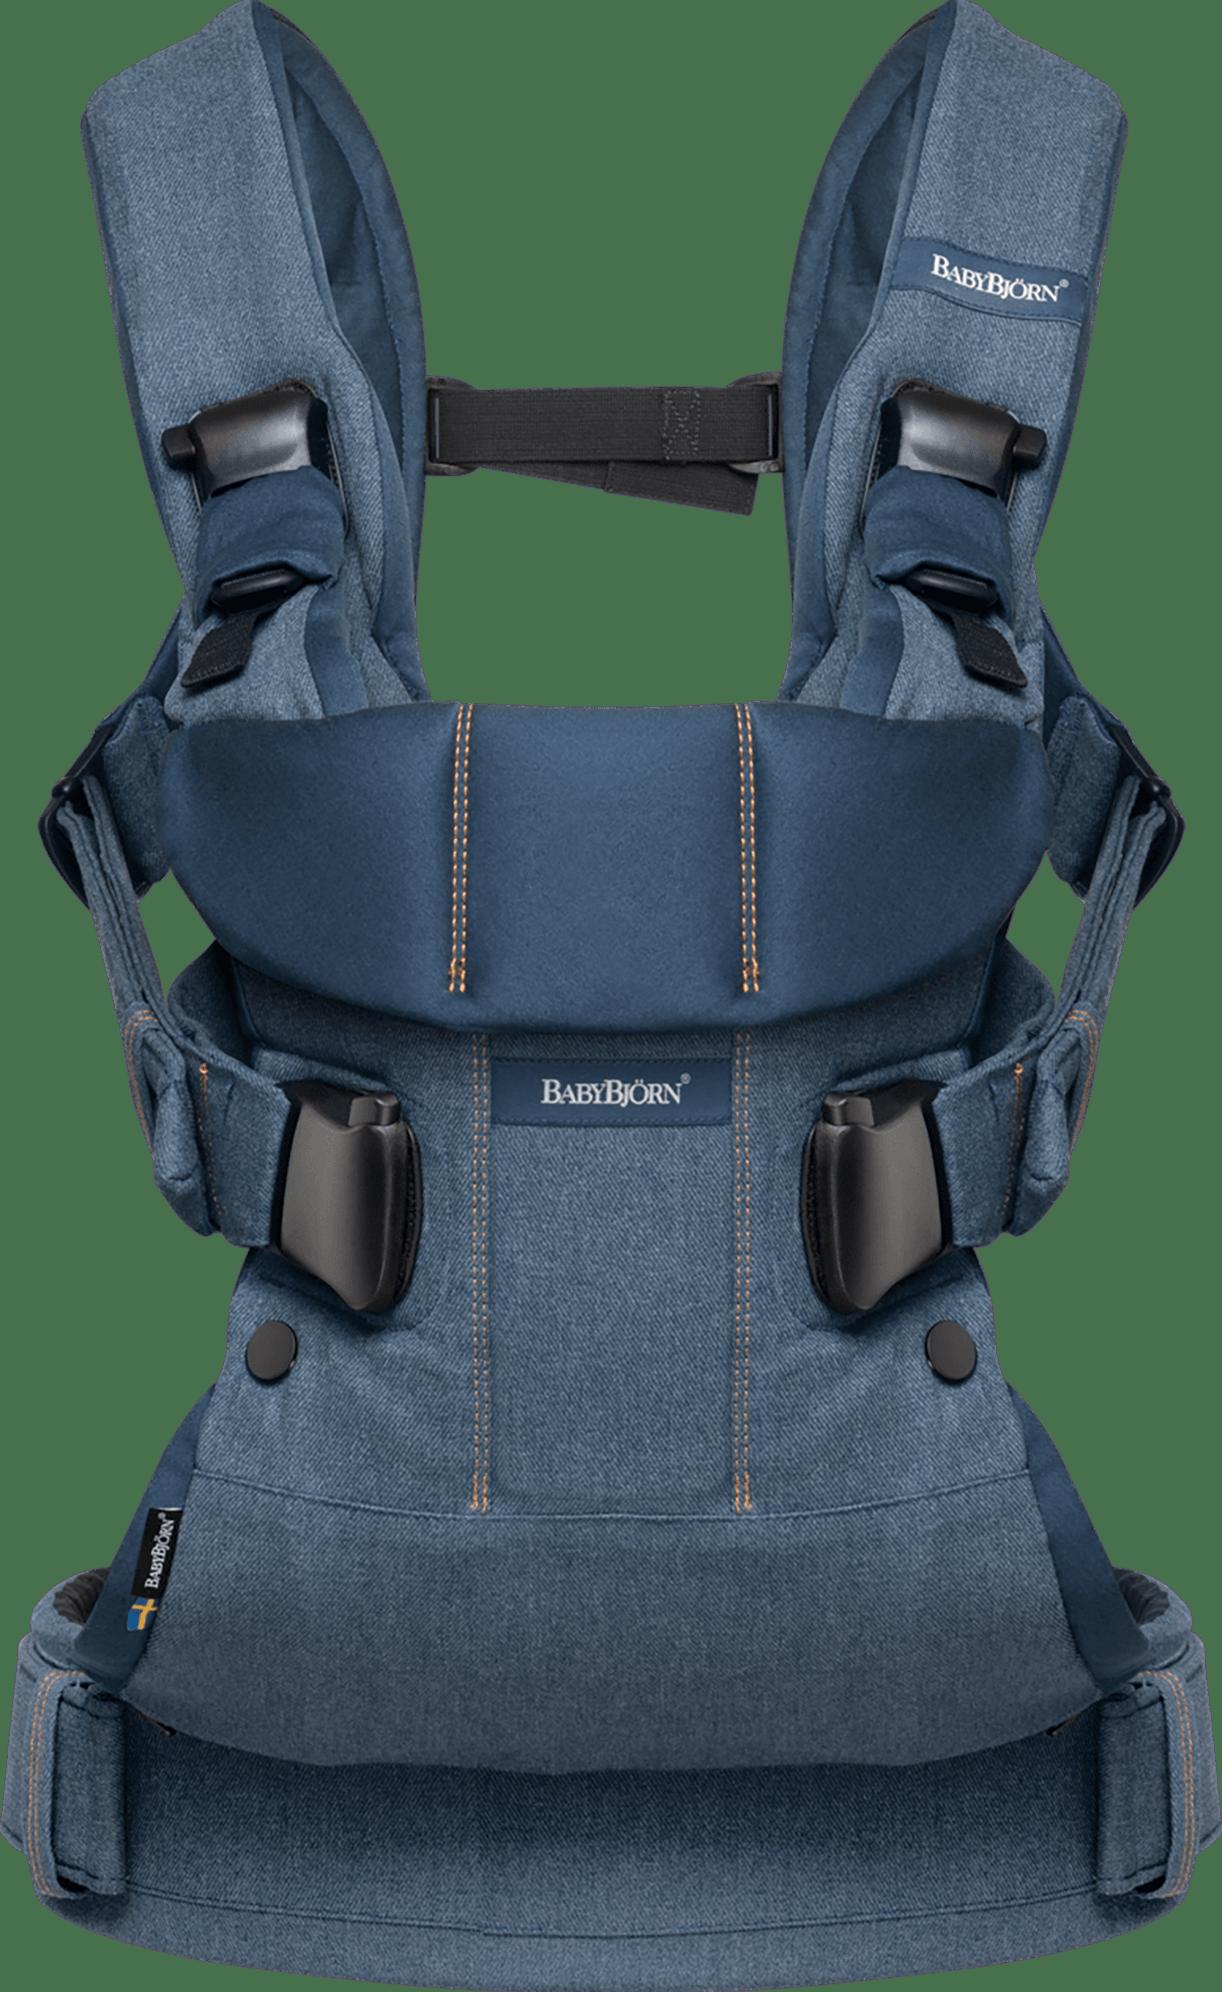 Baby Carrier e – an ergonomic best seller